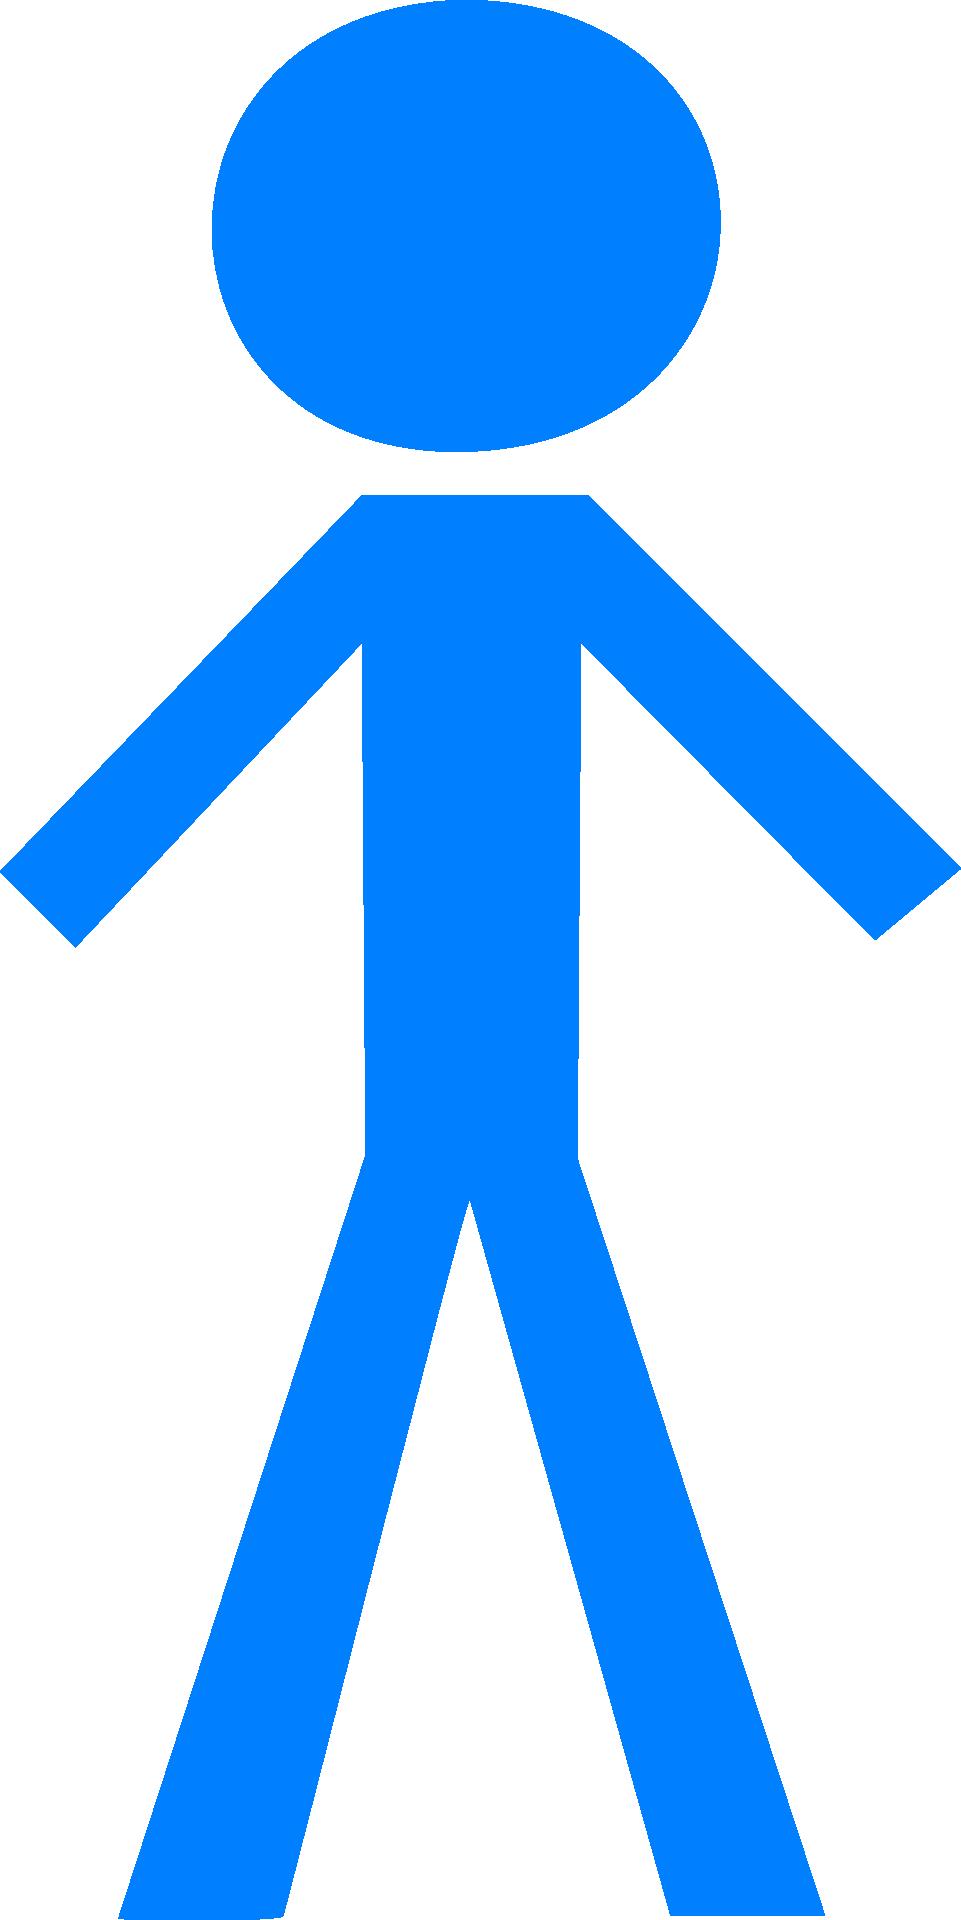 Blue stick man person figure clipart free image.